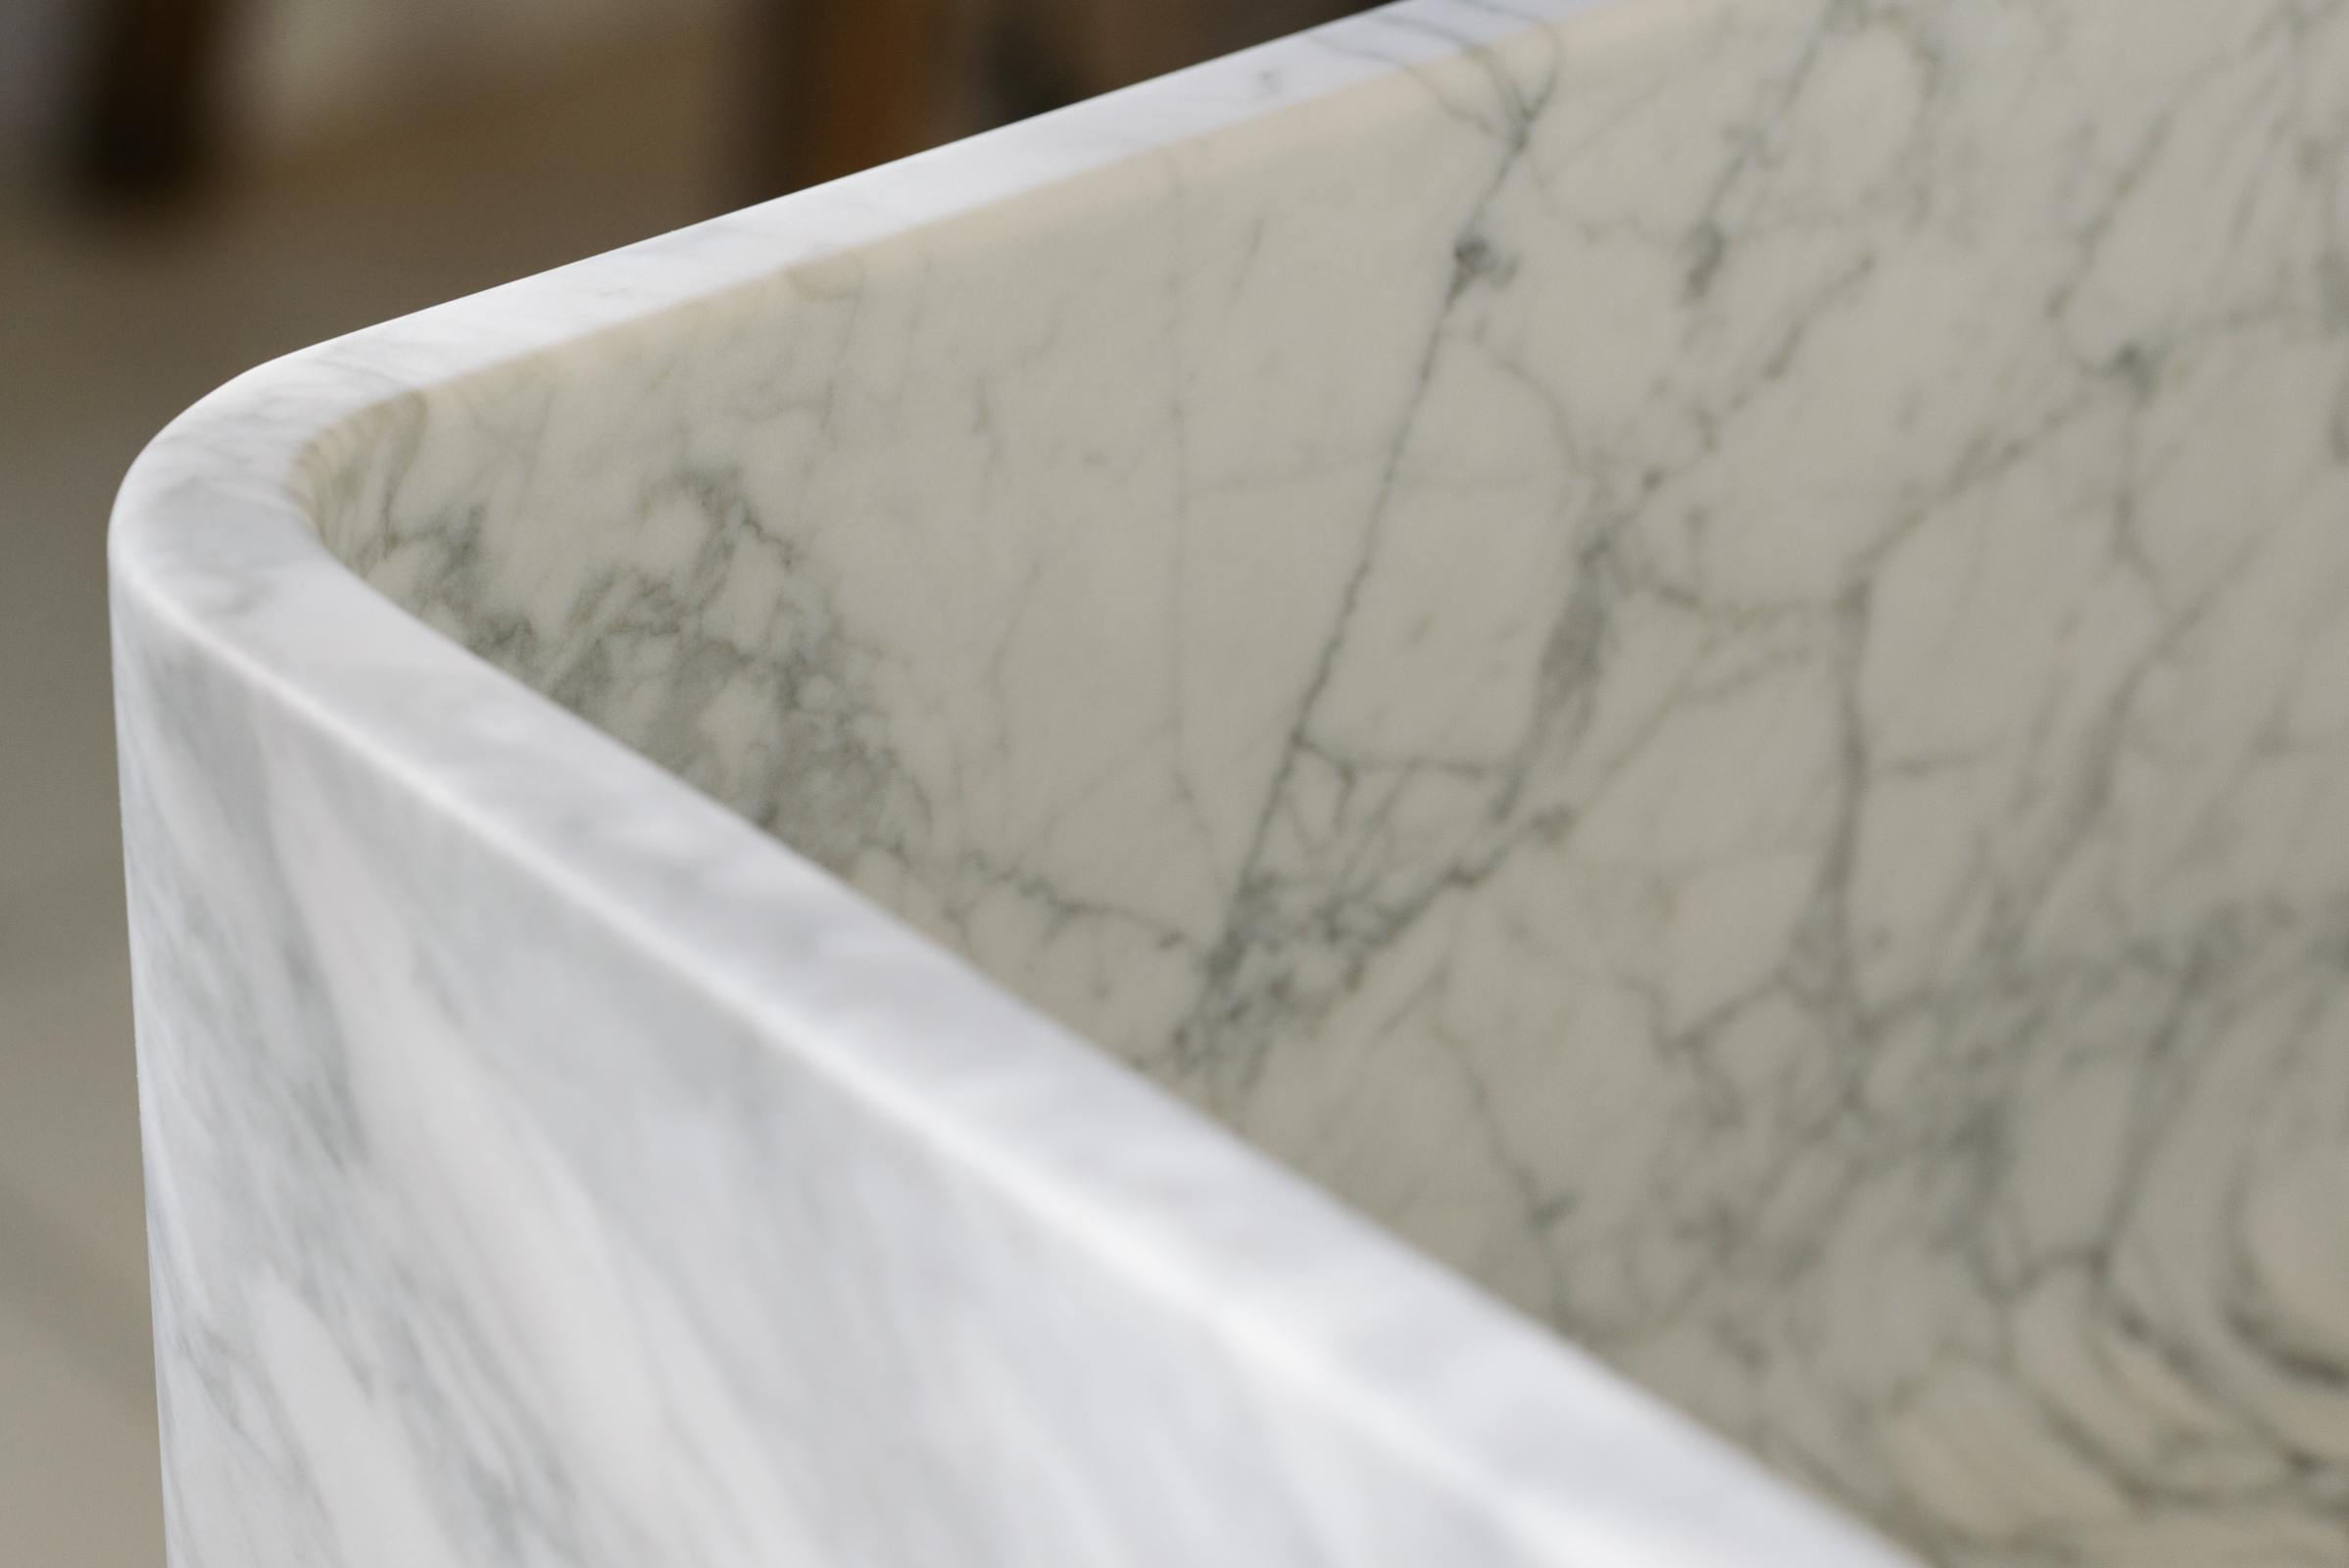 Milano Penthouse 800 Single Marble Sink photo 5